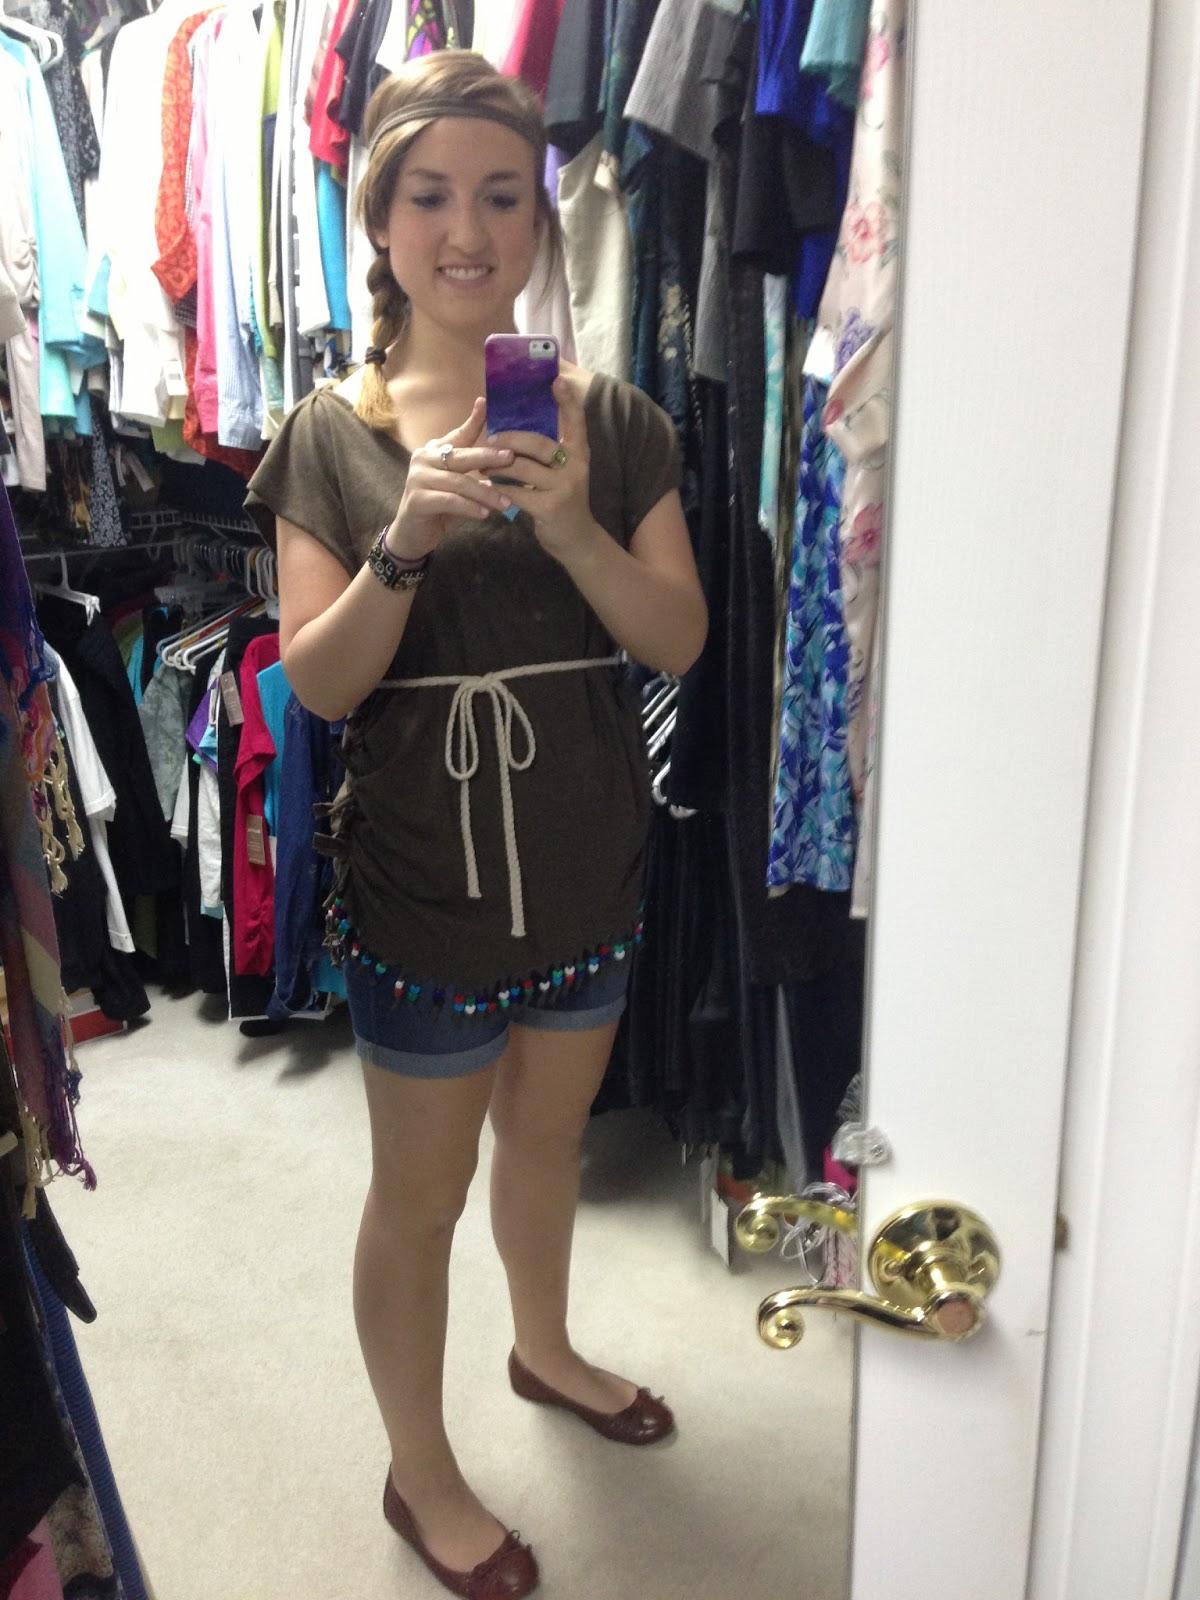 sc 1 st  Marisa Markwardt & Marisa Markwardt: DIY: Native American Costume